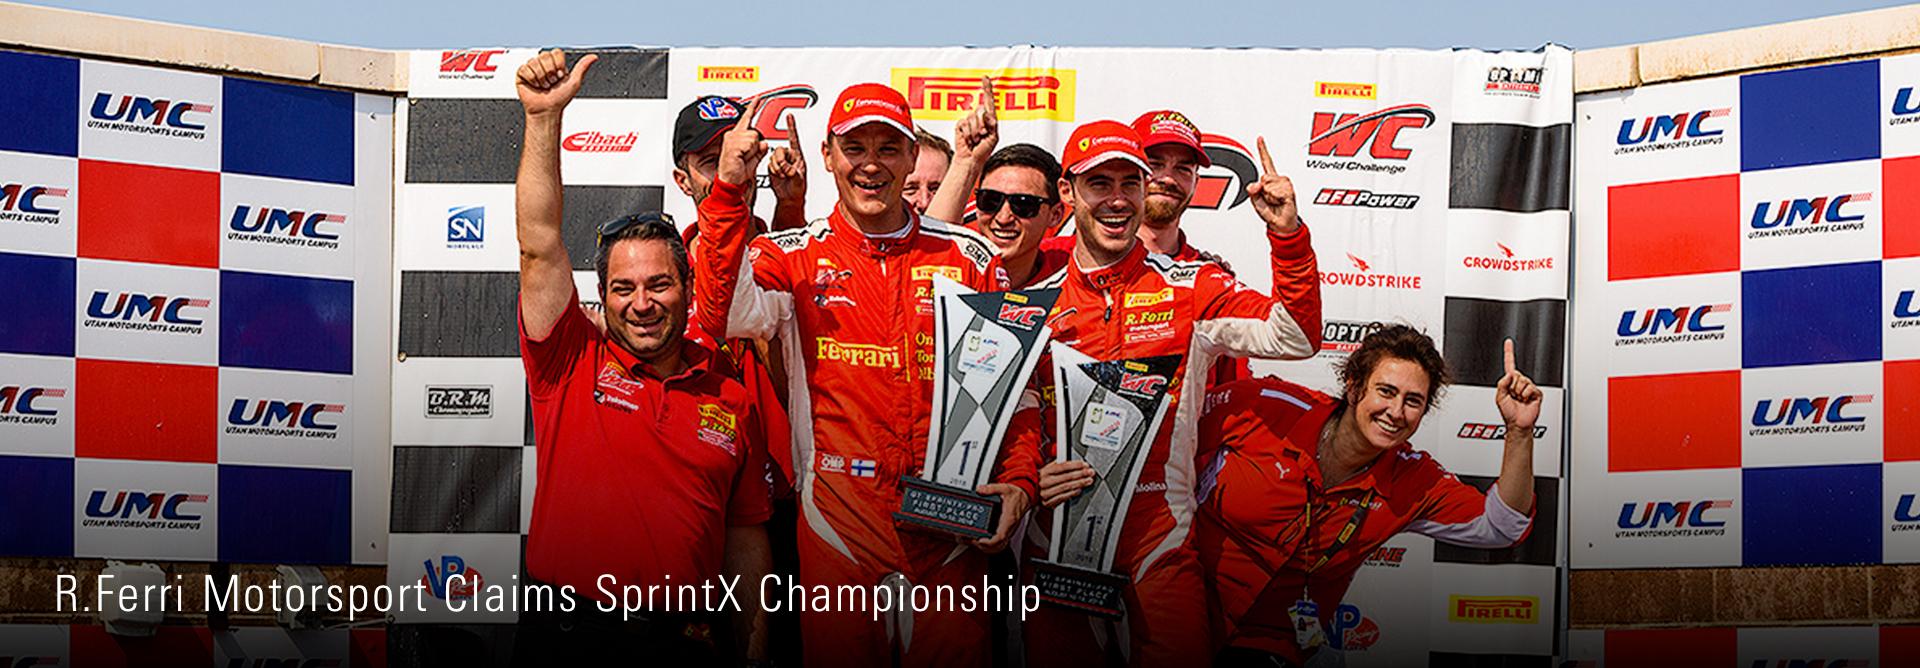 FerrariMaseratiofOntario-ChampionsBanner (1)correct